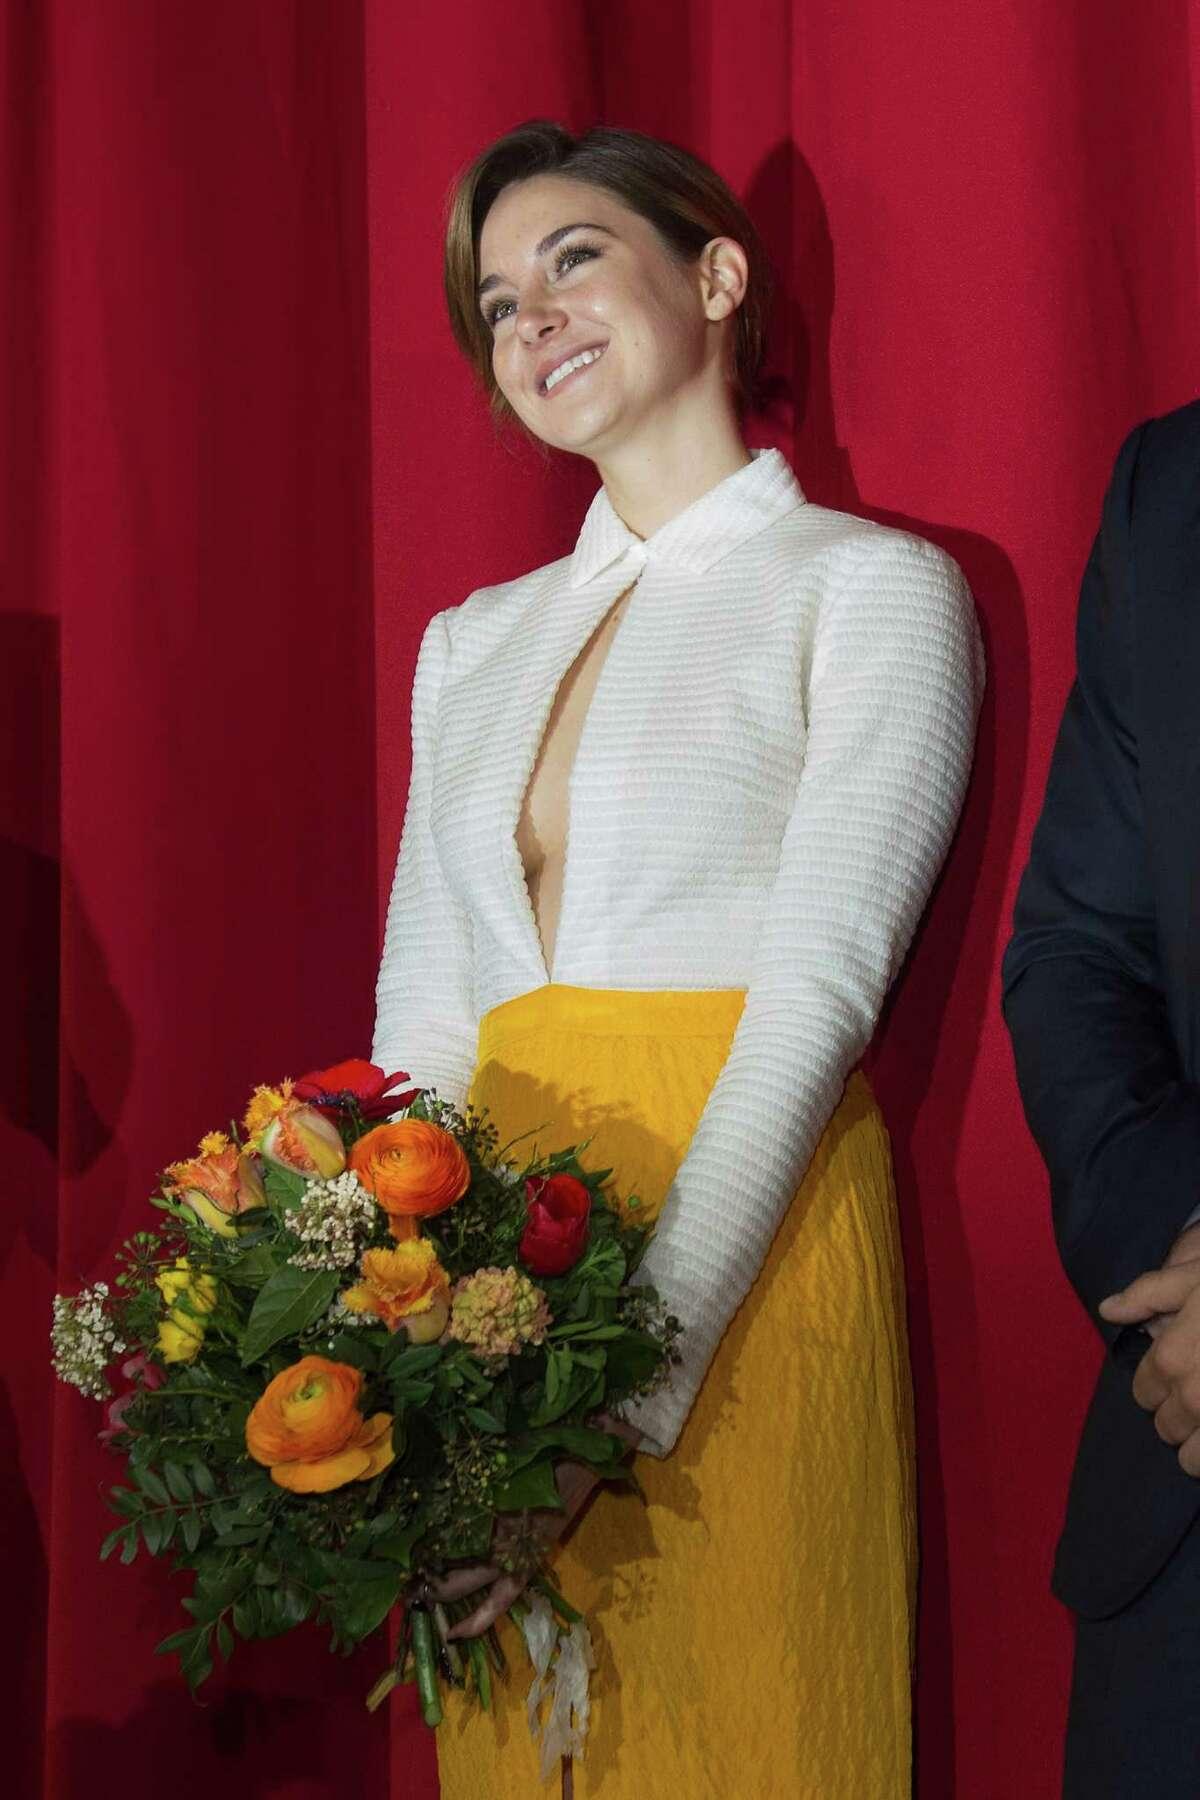 Actress Shailene Woodley attends the German Premiere of 'Die Bestimmung - Insurgent' at CineStar on March 13, 2015 in Berlin, Germany. (Photo by Target Presse Agentur Gmbh/WireImage)